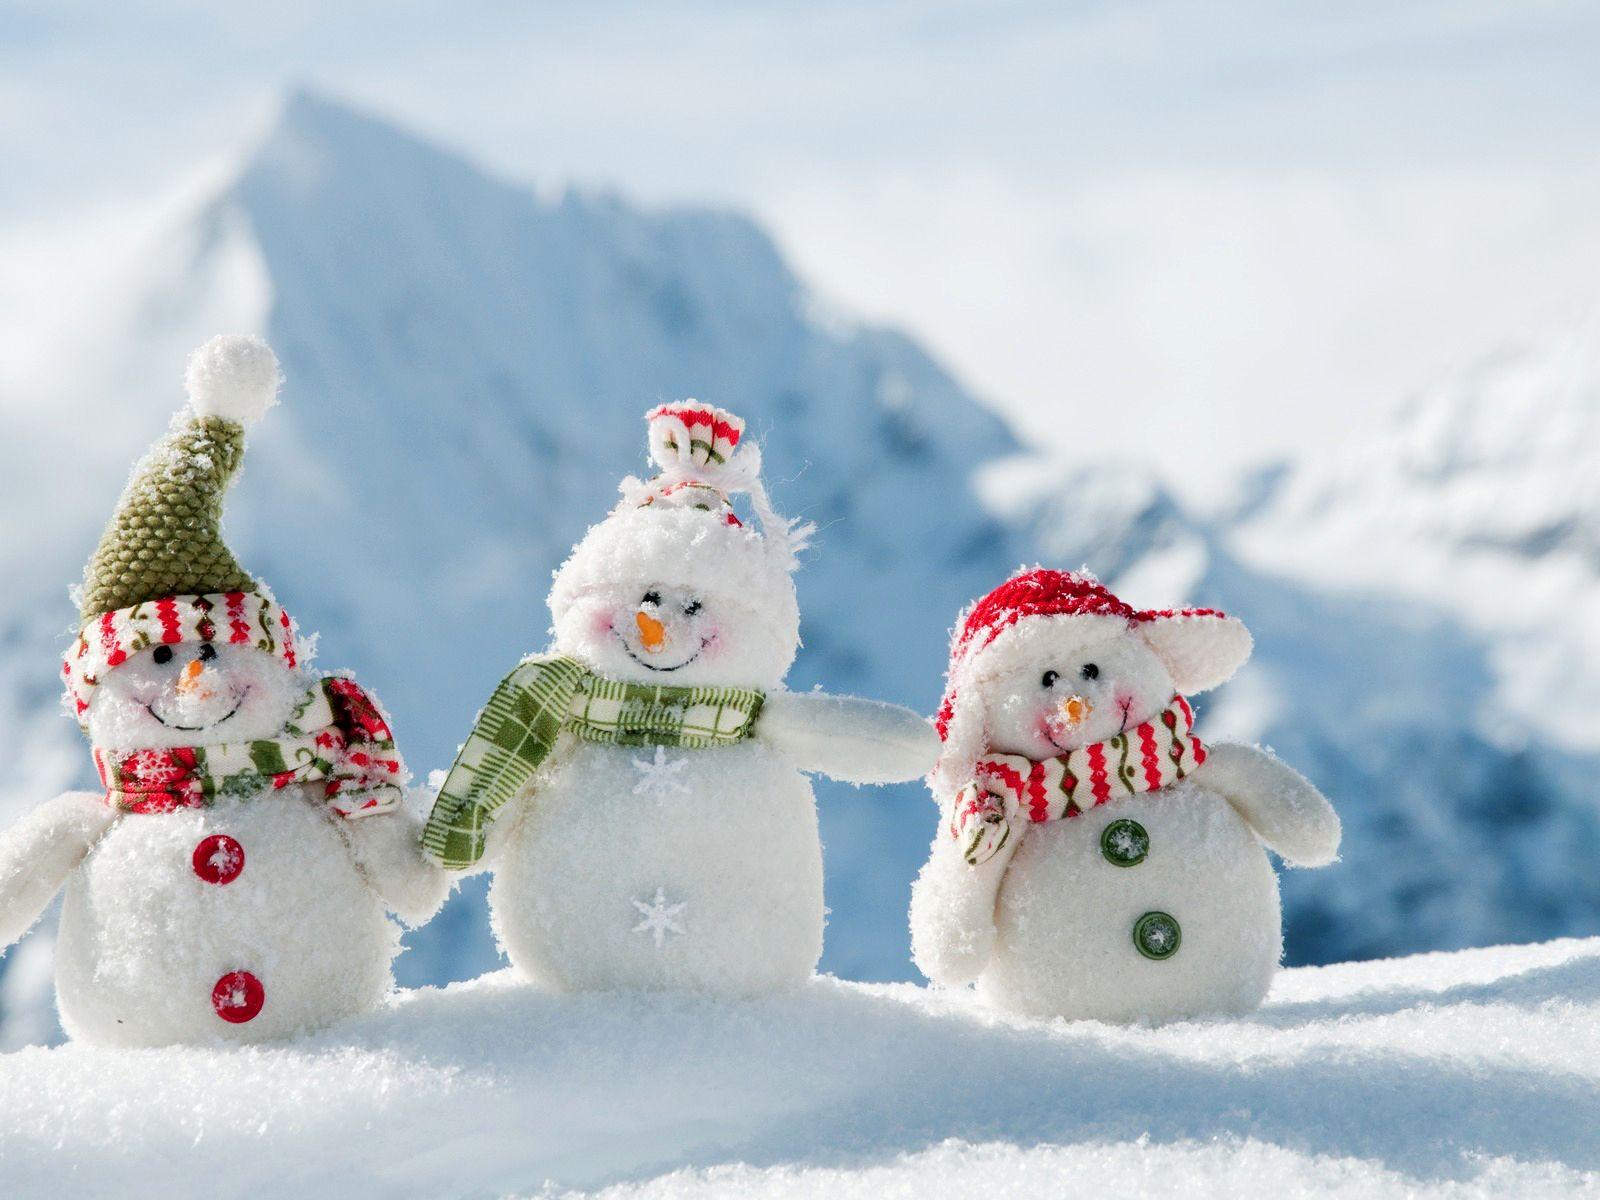 Http 4 Bp Blogspot Com Kedi2rywxos Uls4mgzusgi Aaaaaaaaga4 Uwjwombojje S1600 Smiling Cute Snowmen Mou Snowman Wallpaper Christmas Wallpaper Christmas Crafts